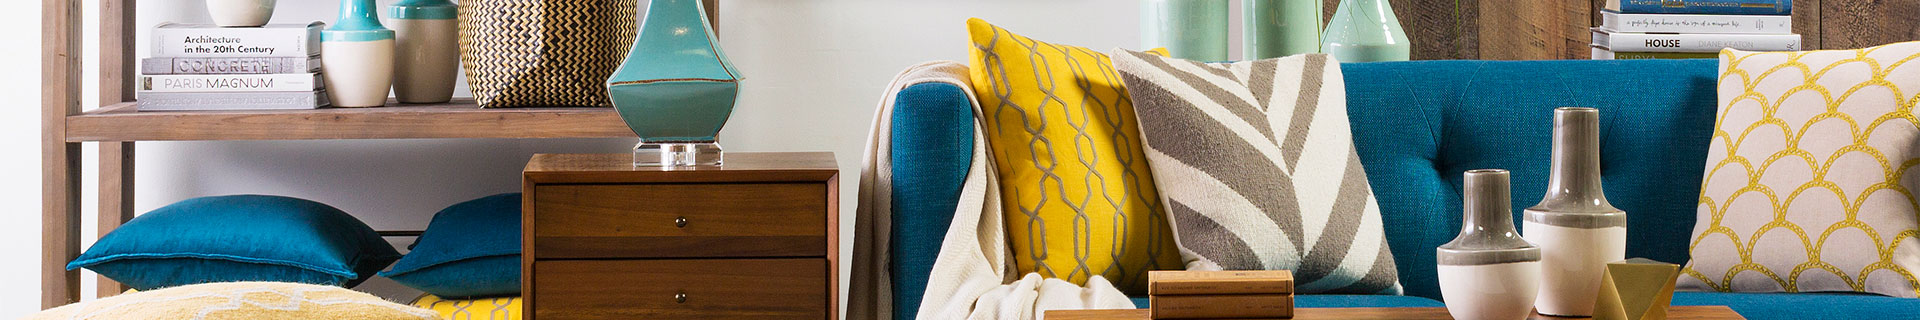 Furniture decor and accessories